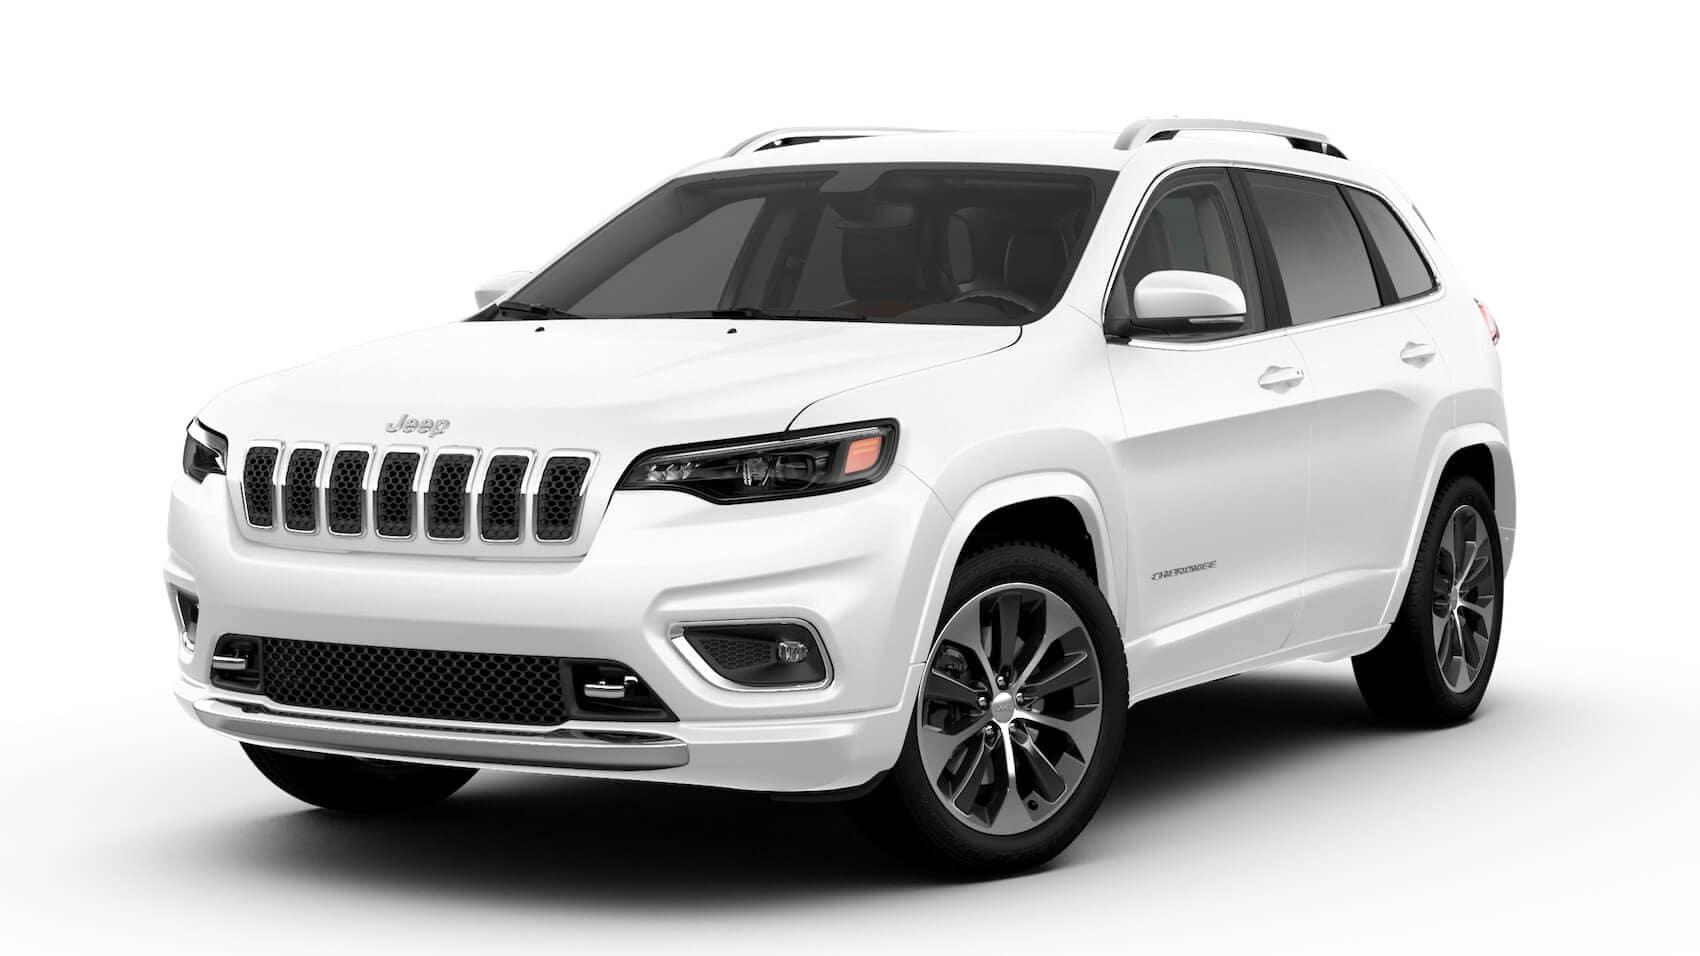 2020 Jeep Cherokee cabin features Wilsonville, OR